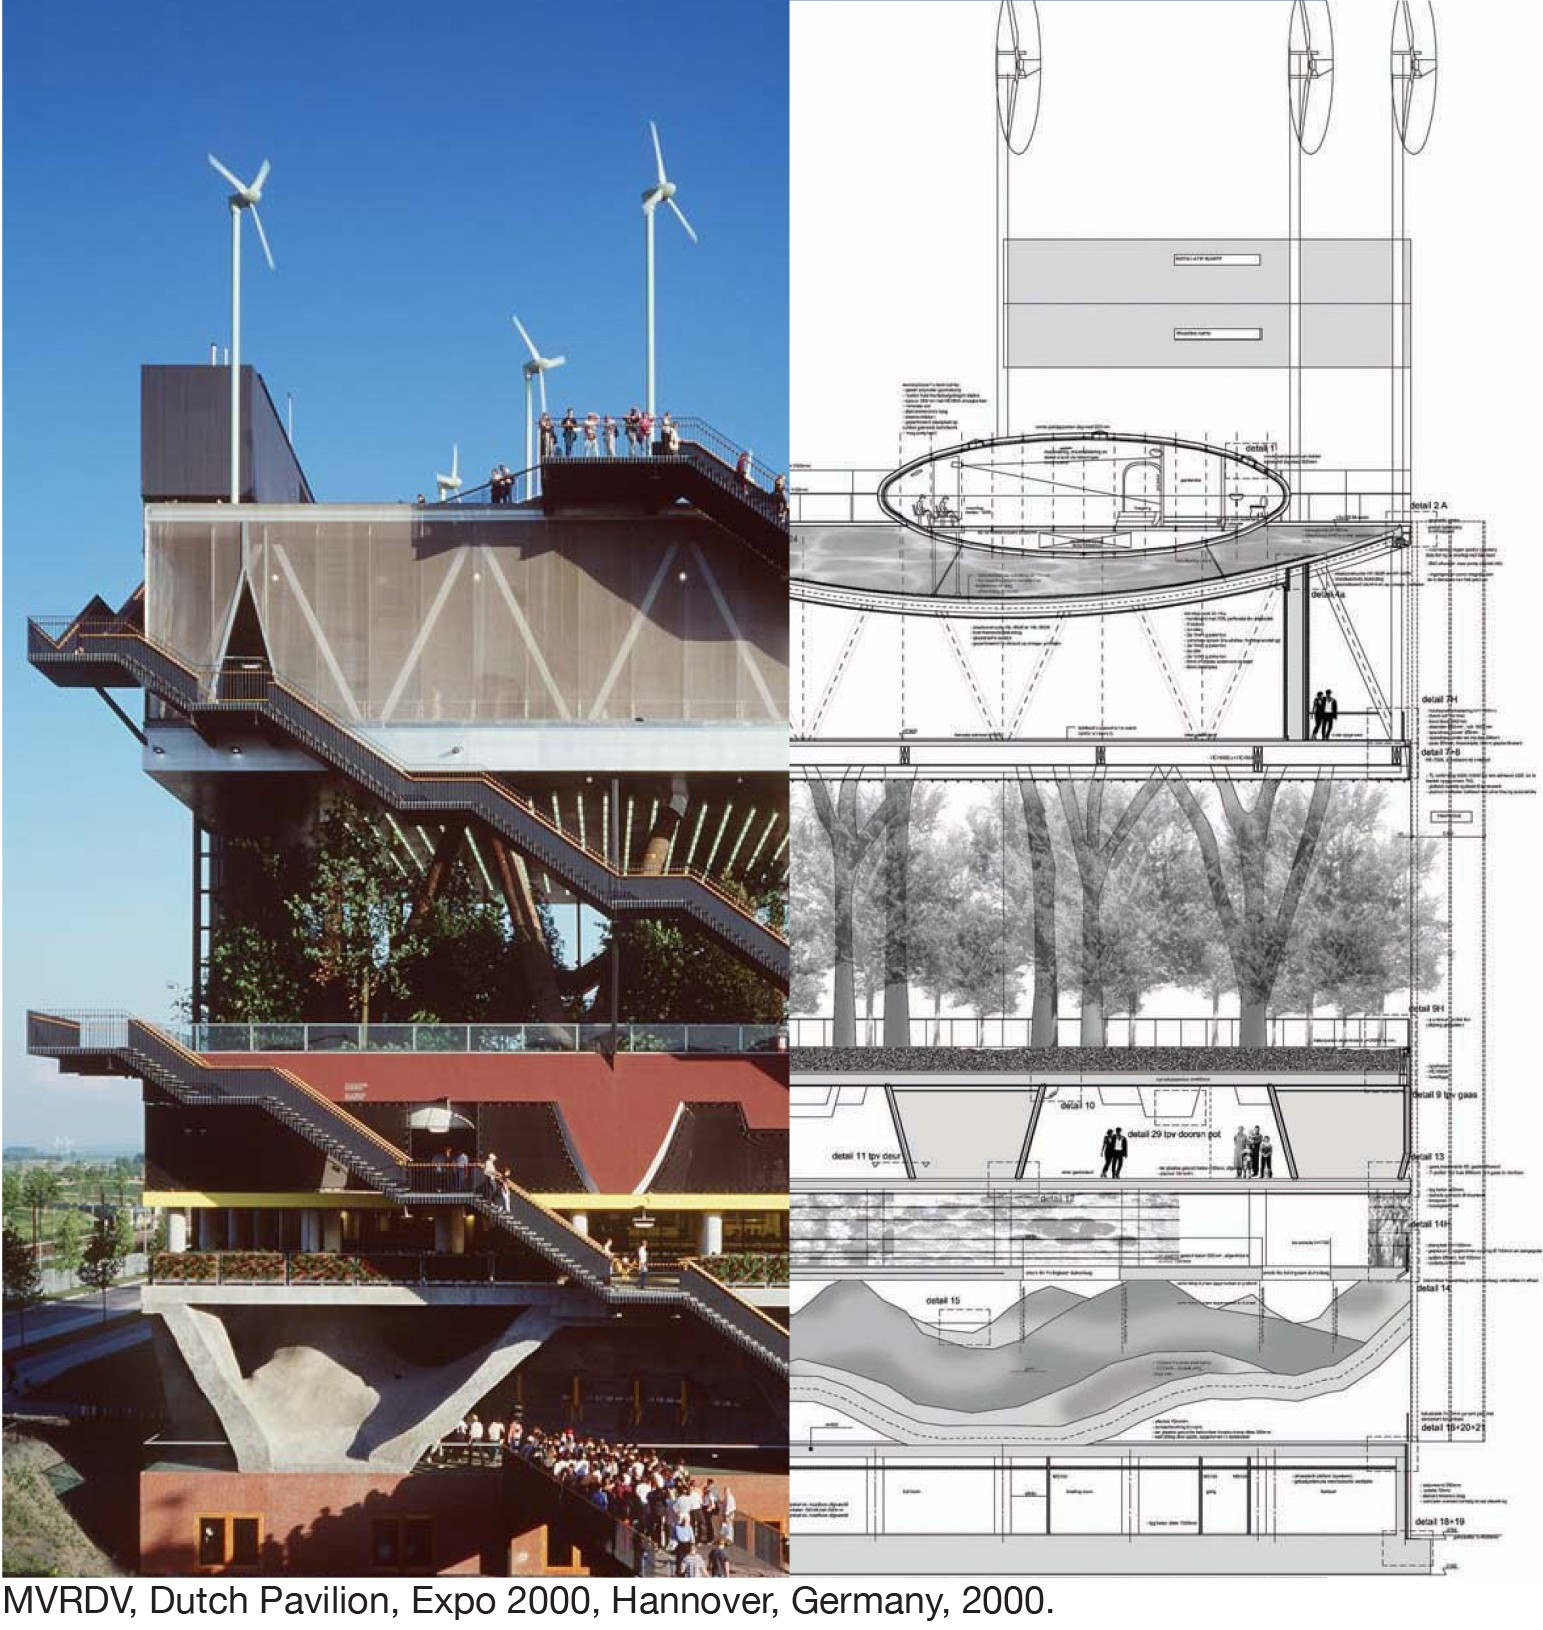 Expo 2000 Pavilion by MVRDV (Hannover, Germany, 1997-2000)